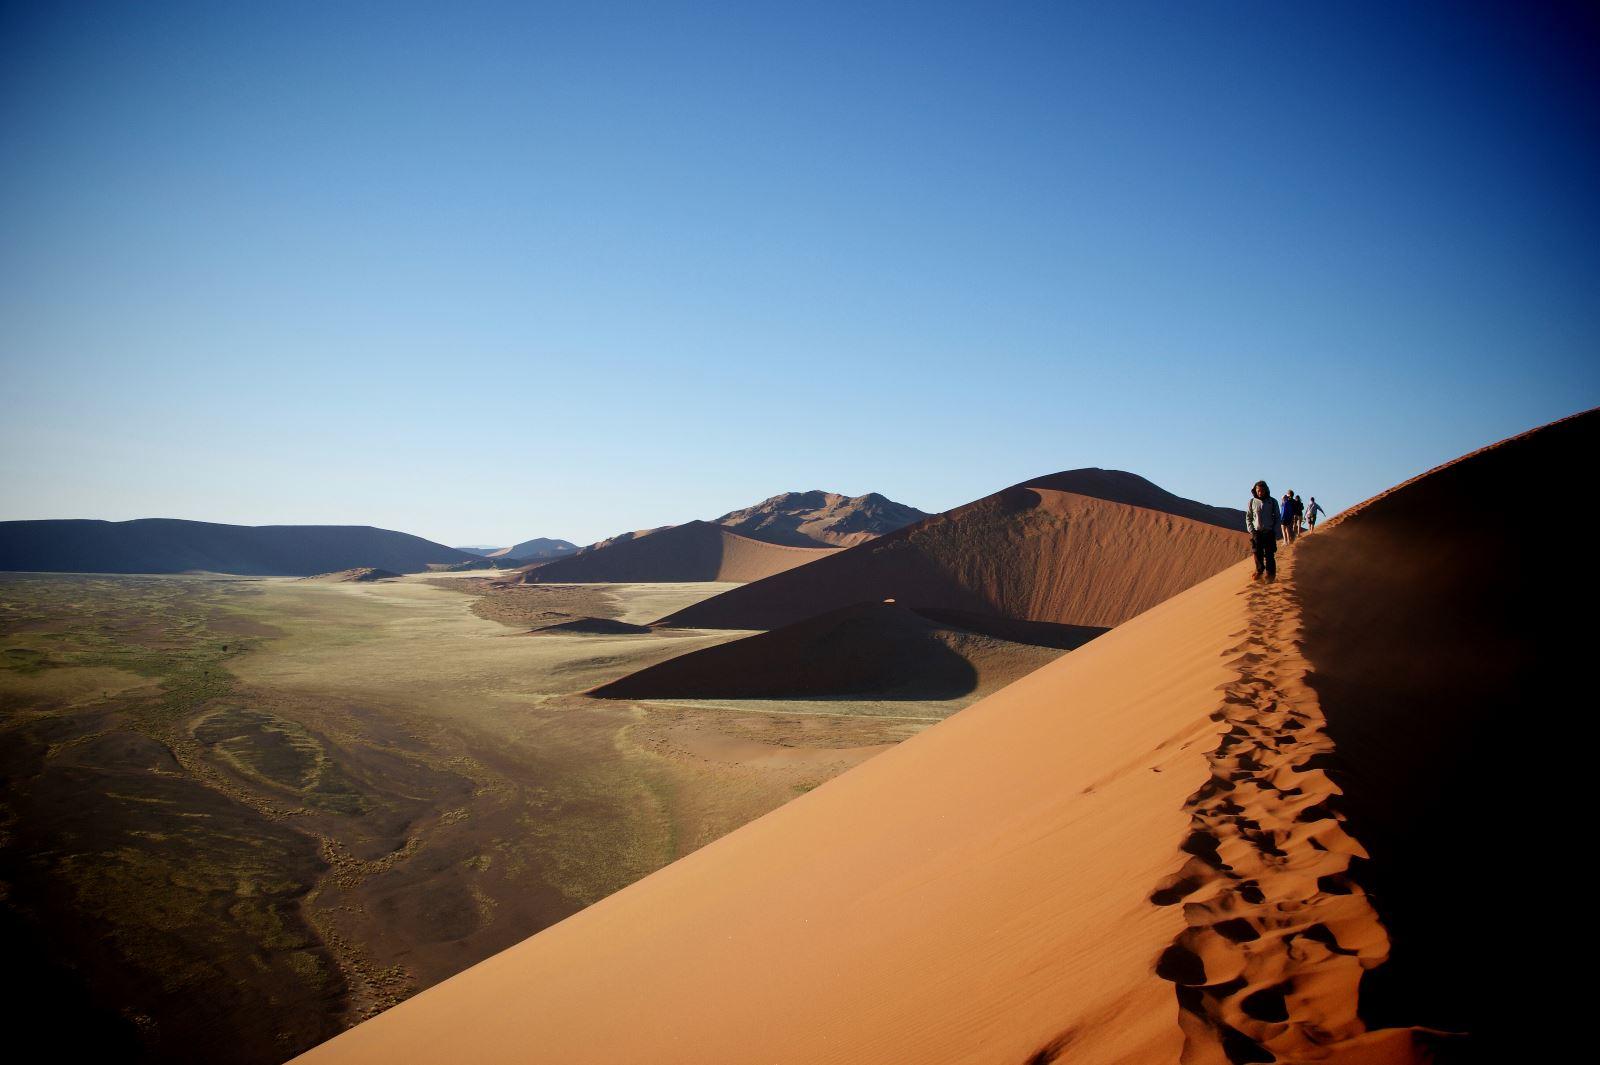 Dunes in Sossusvlei, Namib Naukluft National Park, Namibia